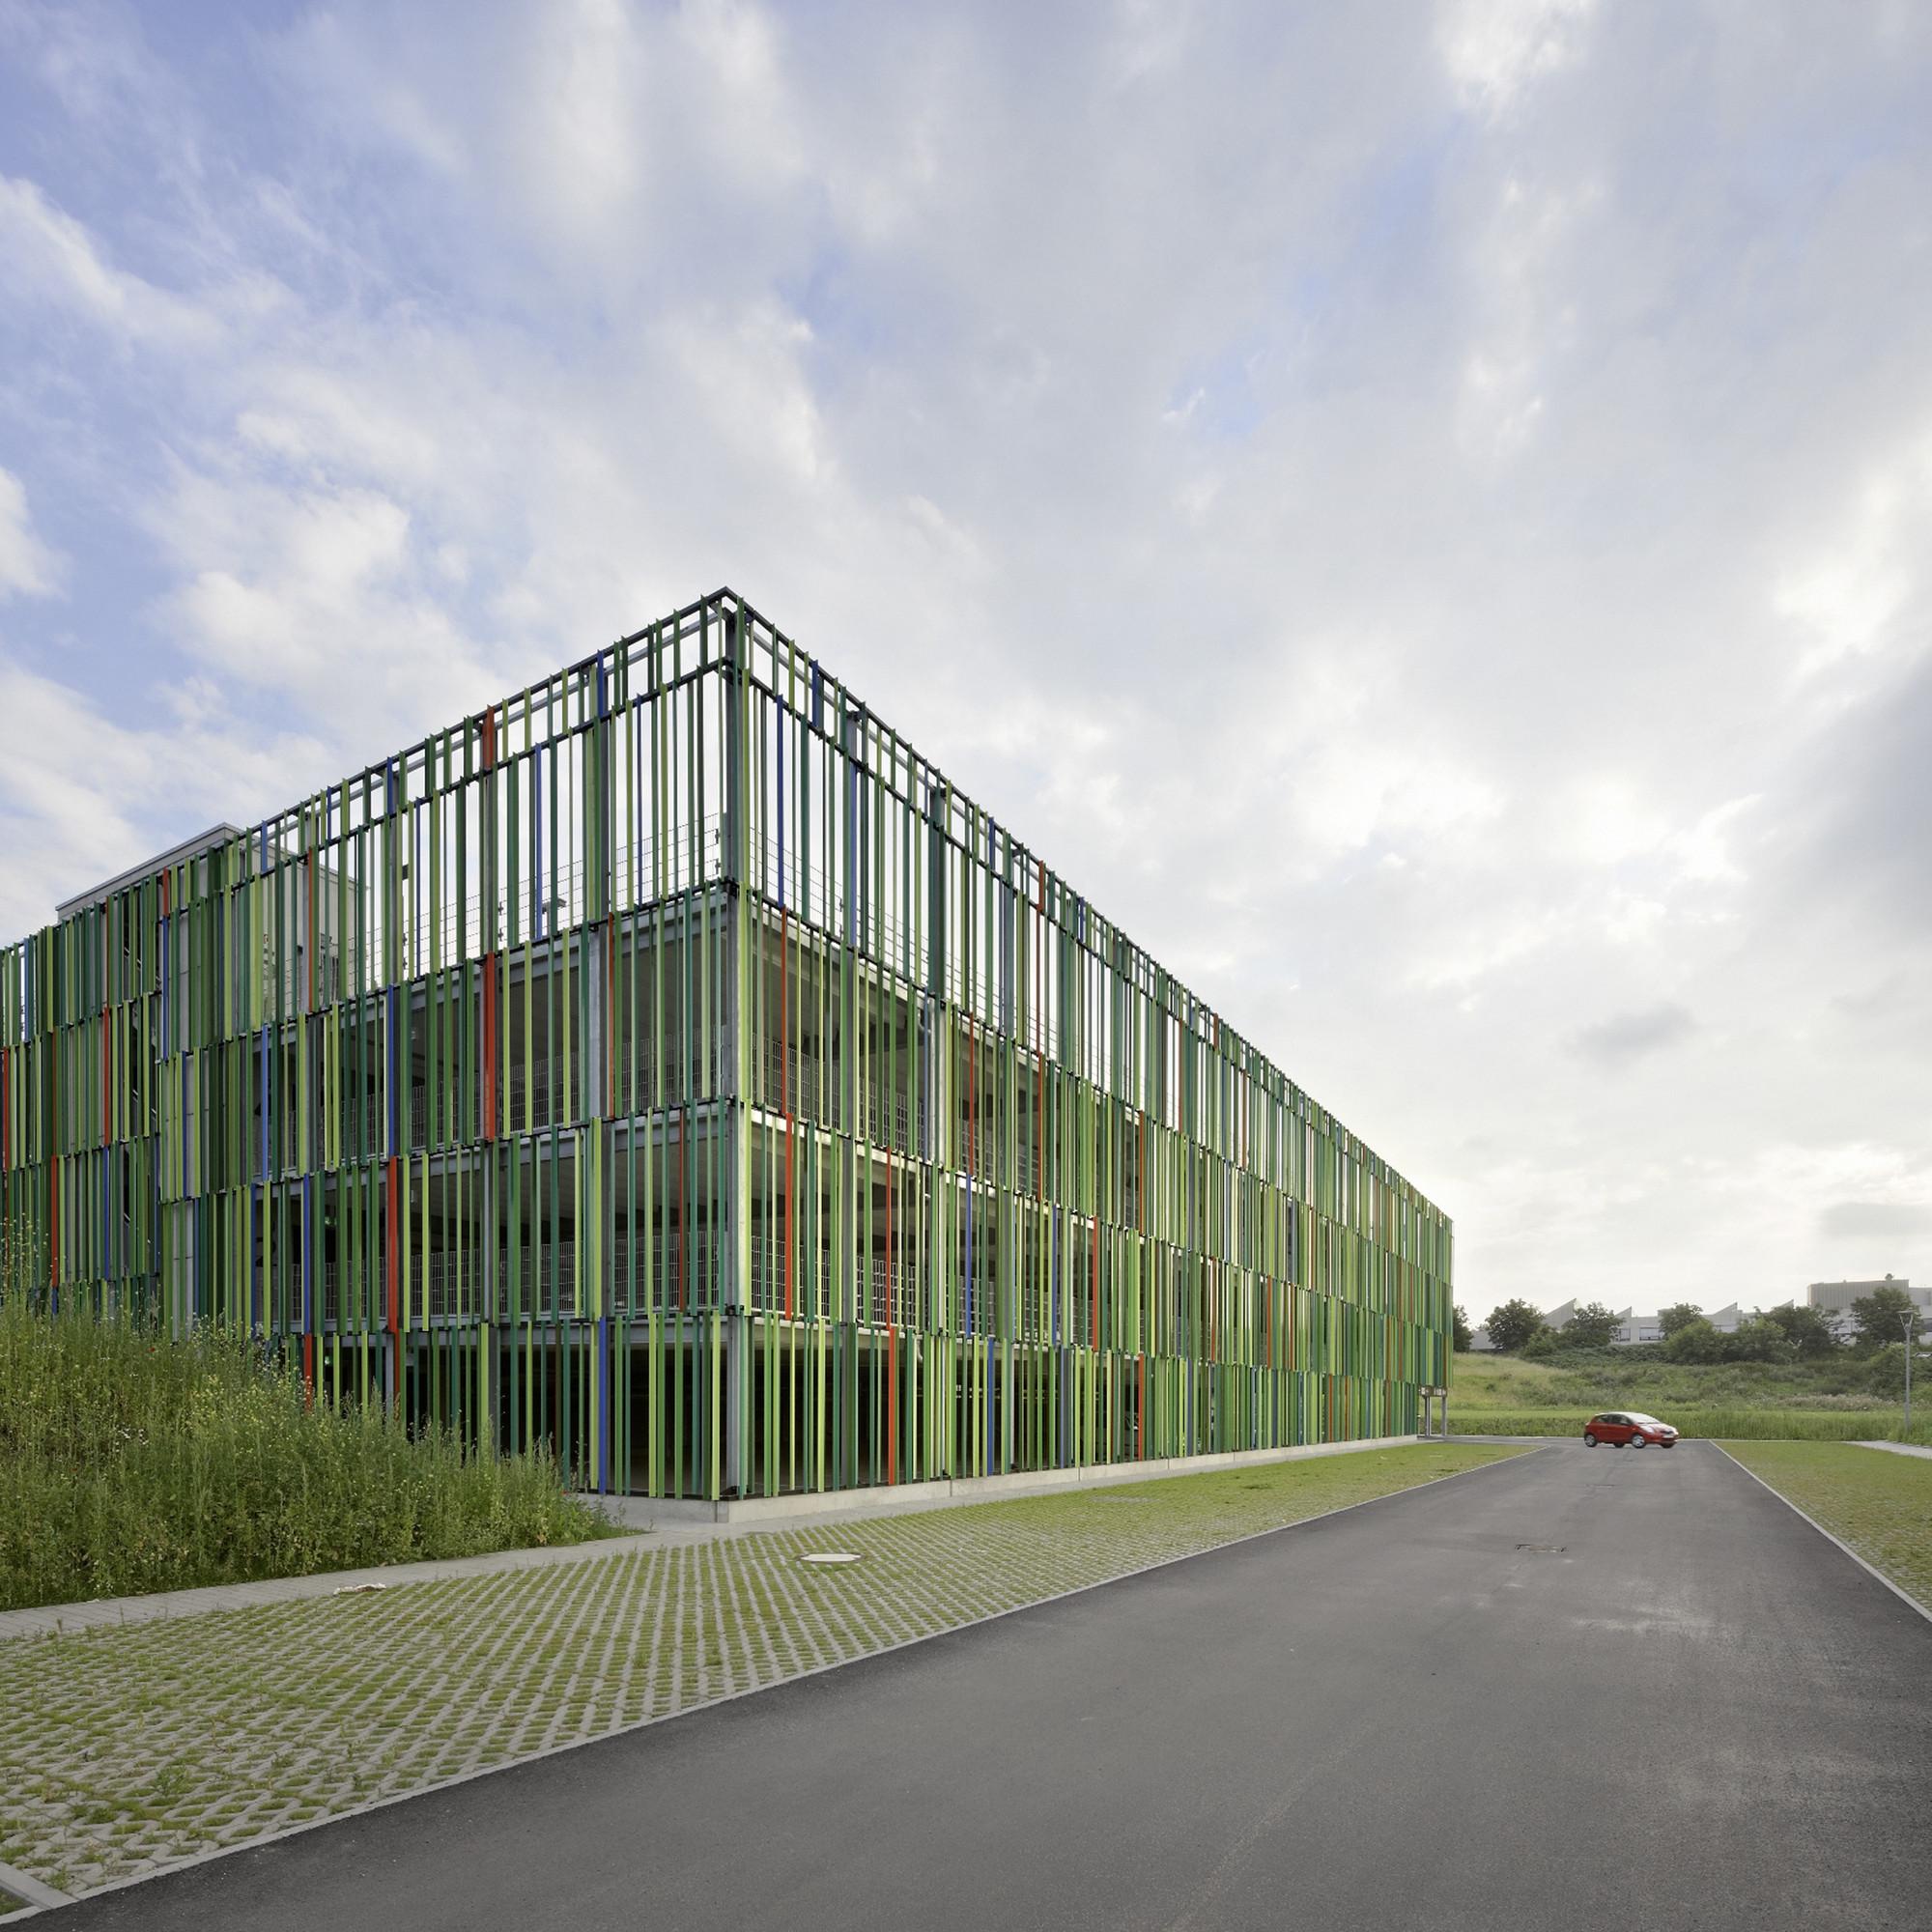 gallery of muliy storey car park jswd architekten 5. Black Bedroom Furniture Sets. Home Design Ideas